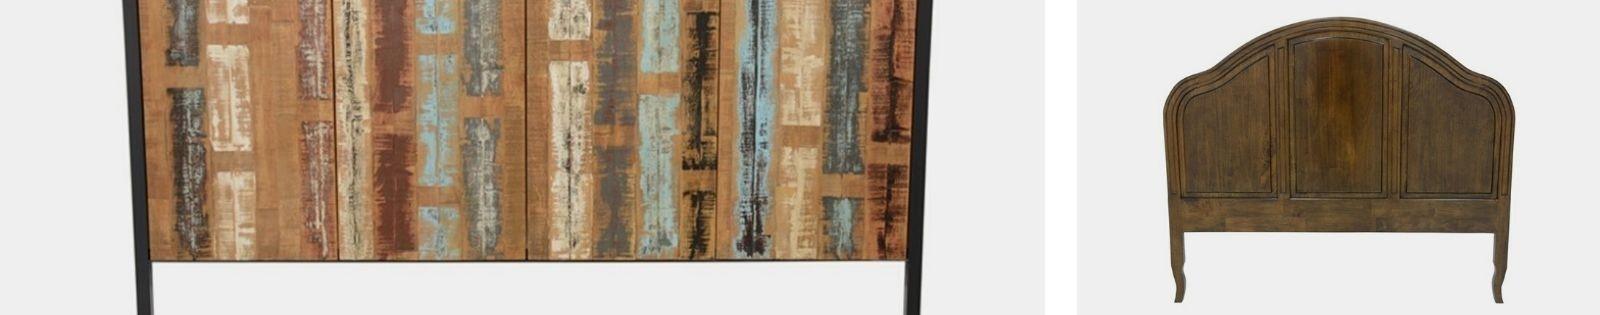 Tête de lit en bois massif : acacia, chêne, hévéa, teck... Lotuséa